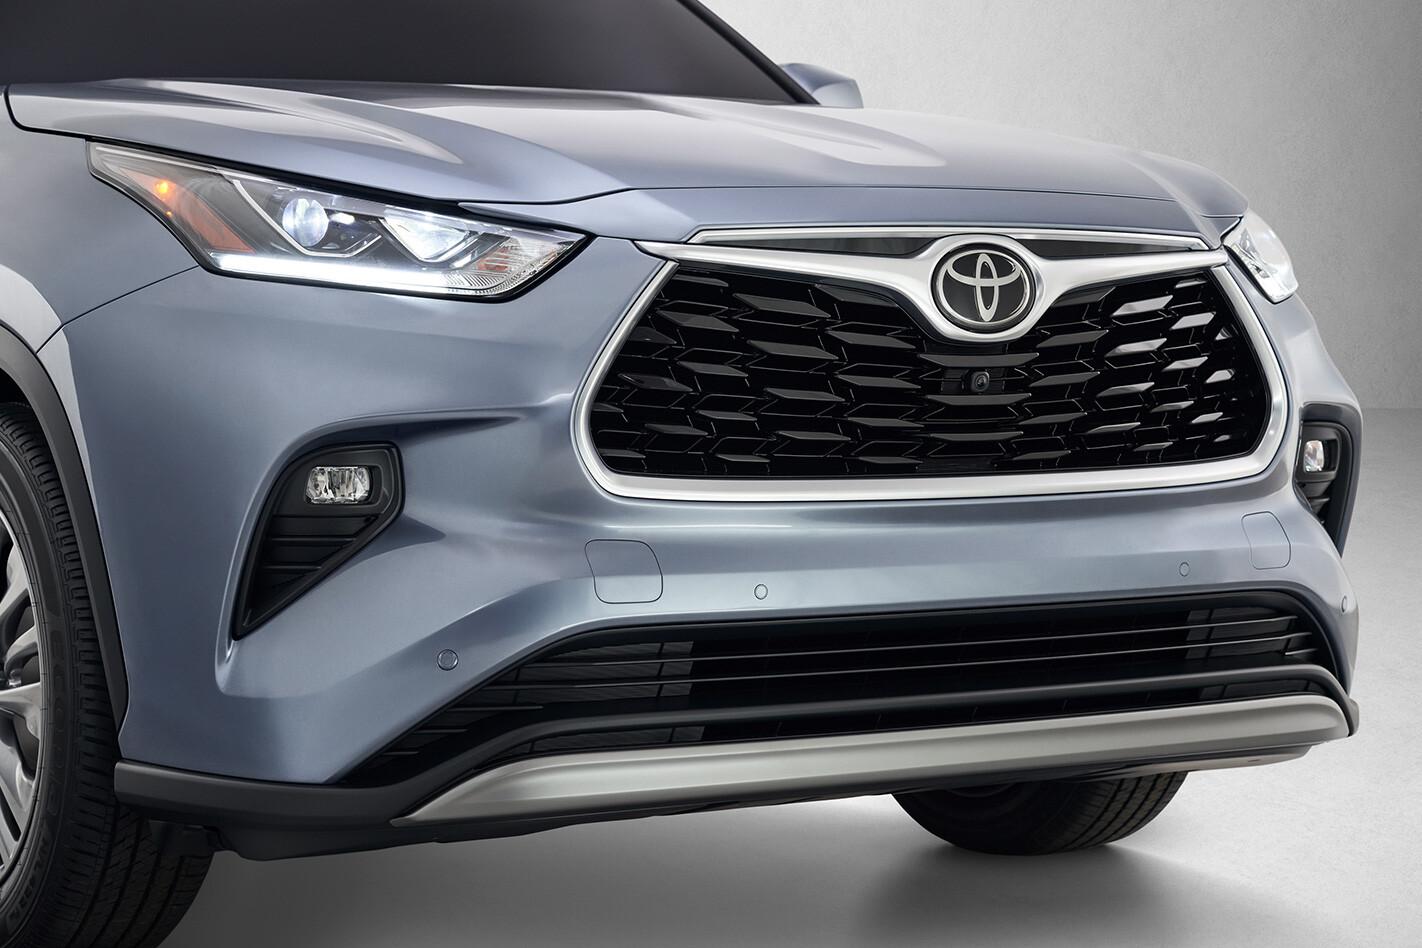 Toyota Kluger Face Jpg